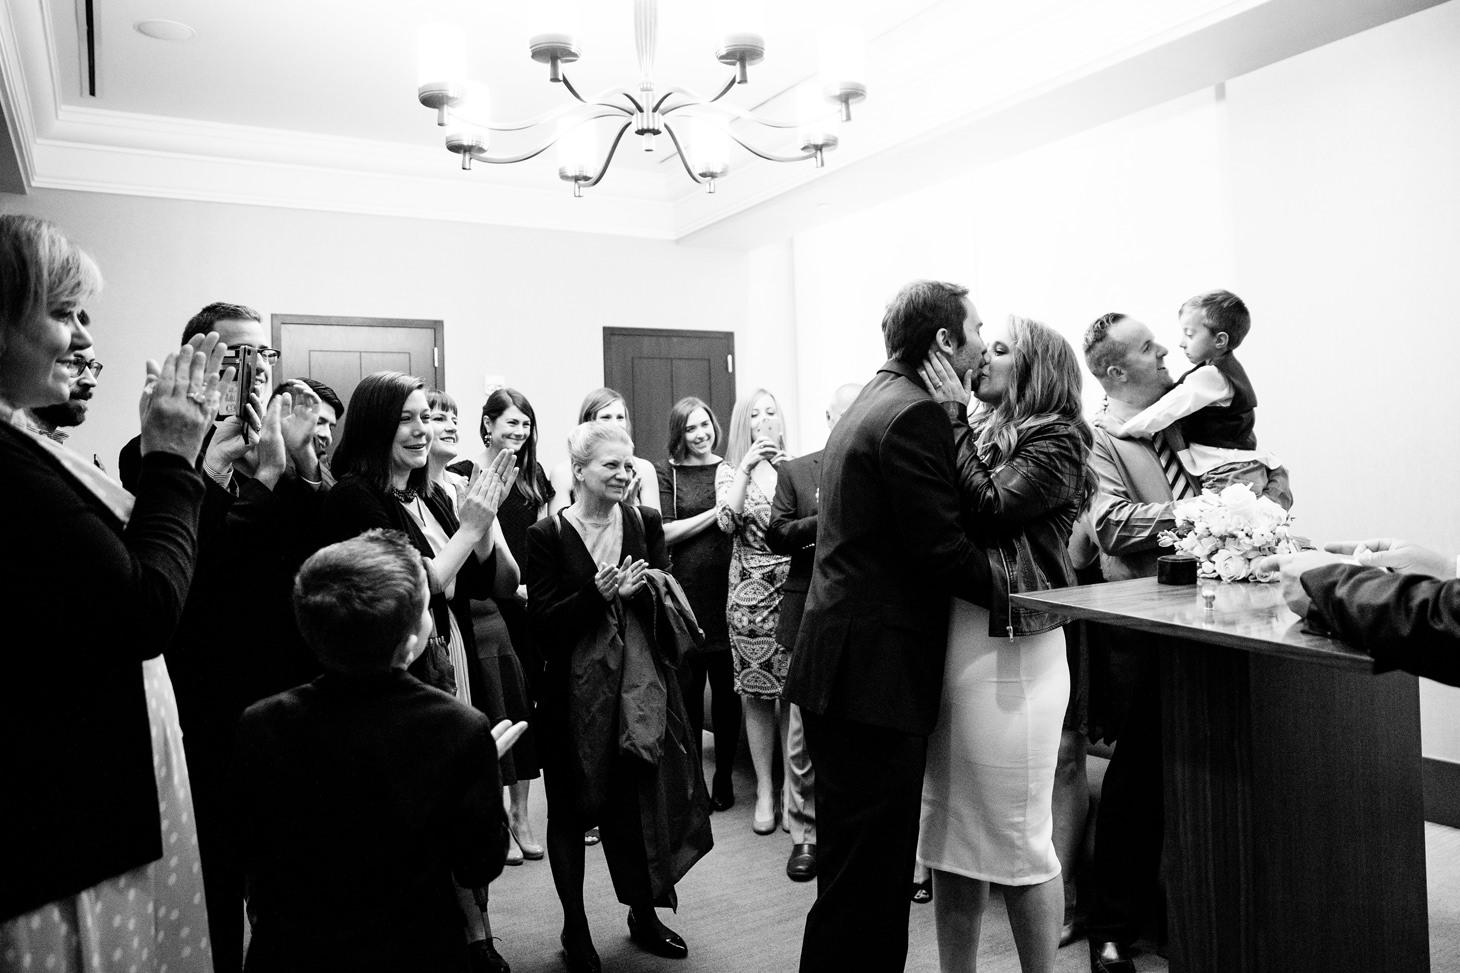 016-NYC-Intimate-Wedding-photography-SmittenChickens-city-hall-lauren-aaron.jpg